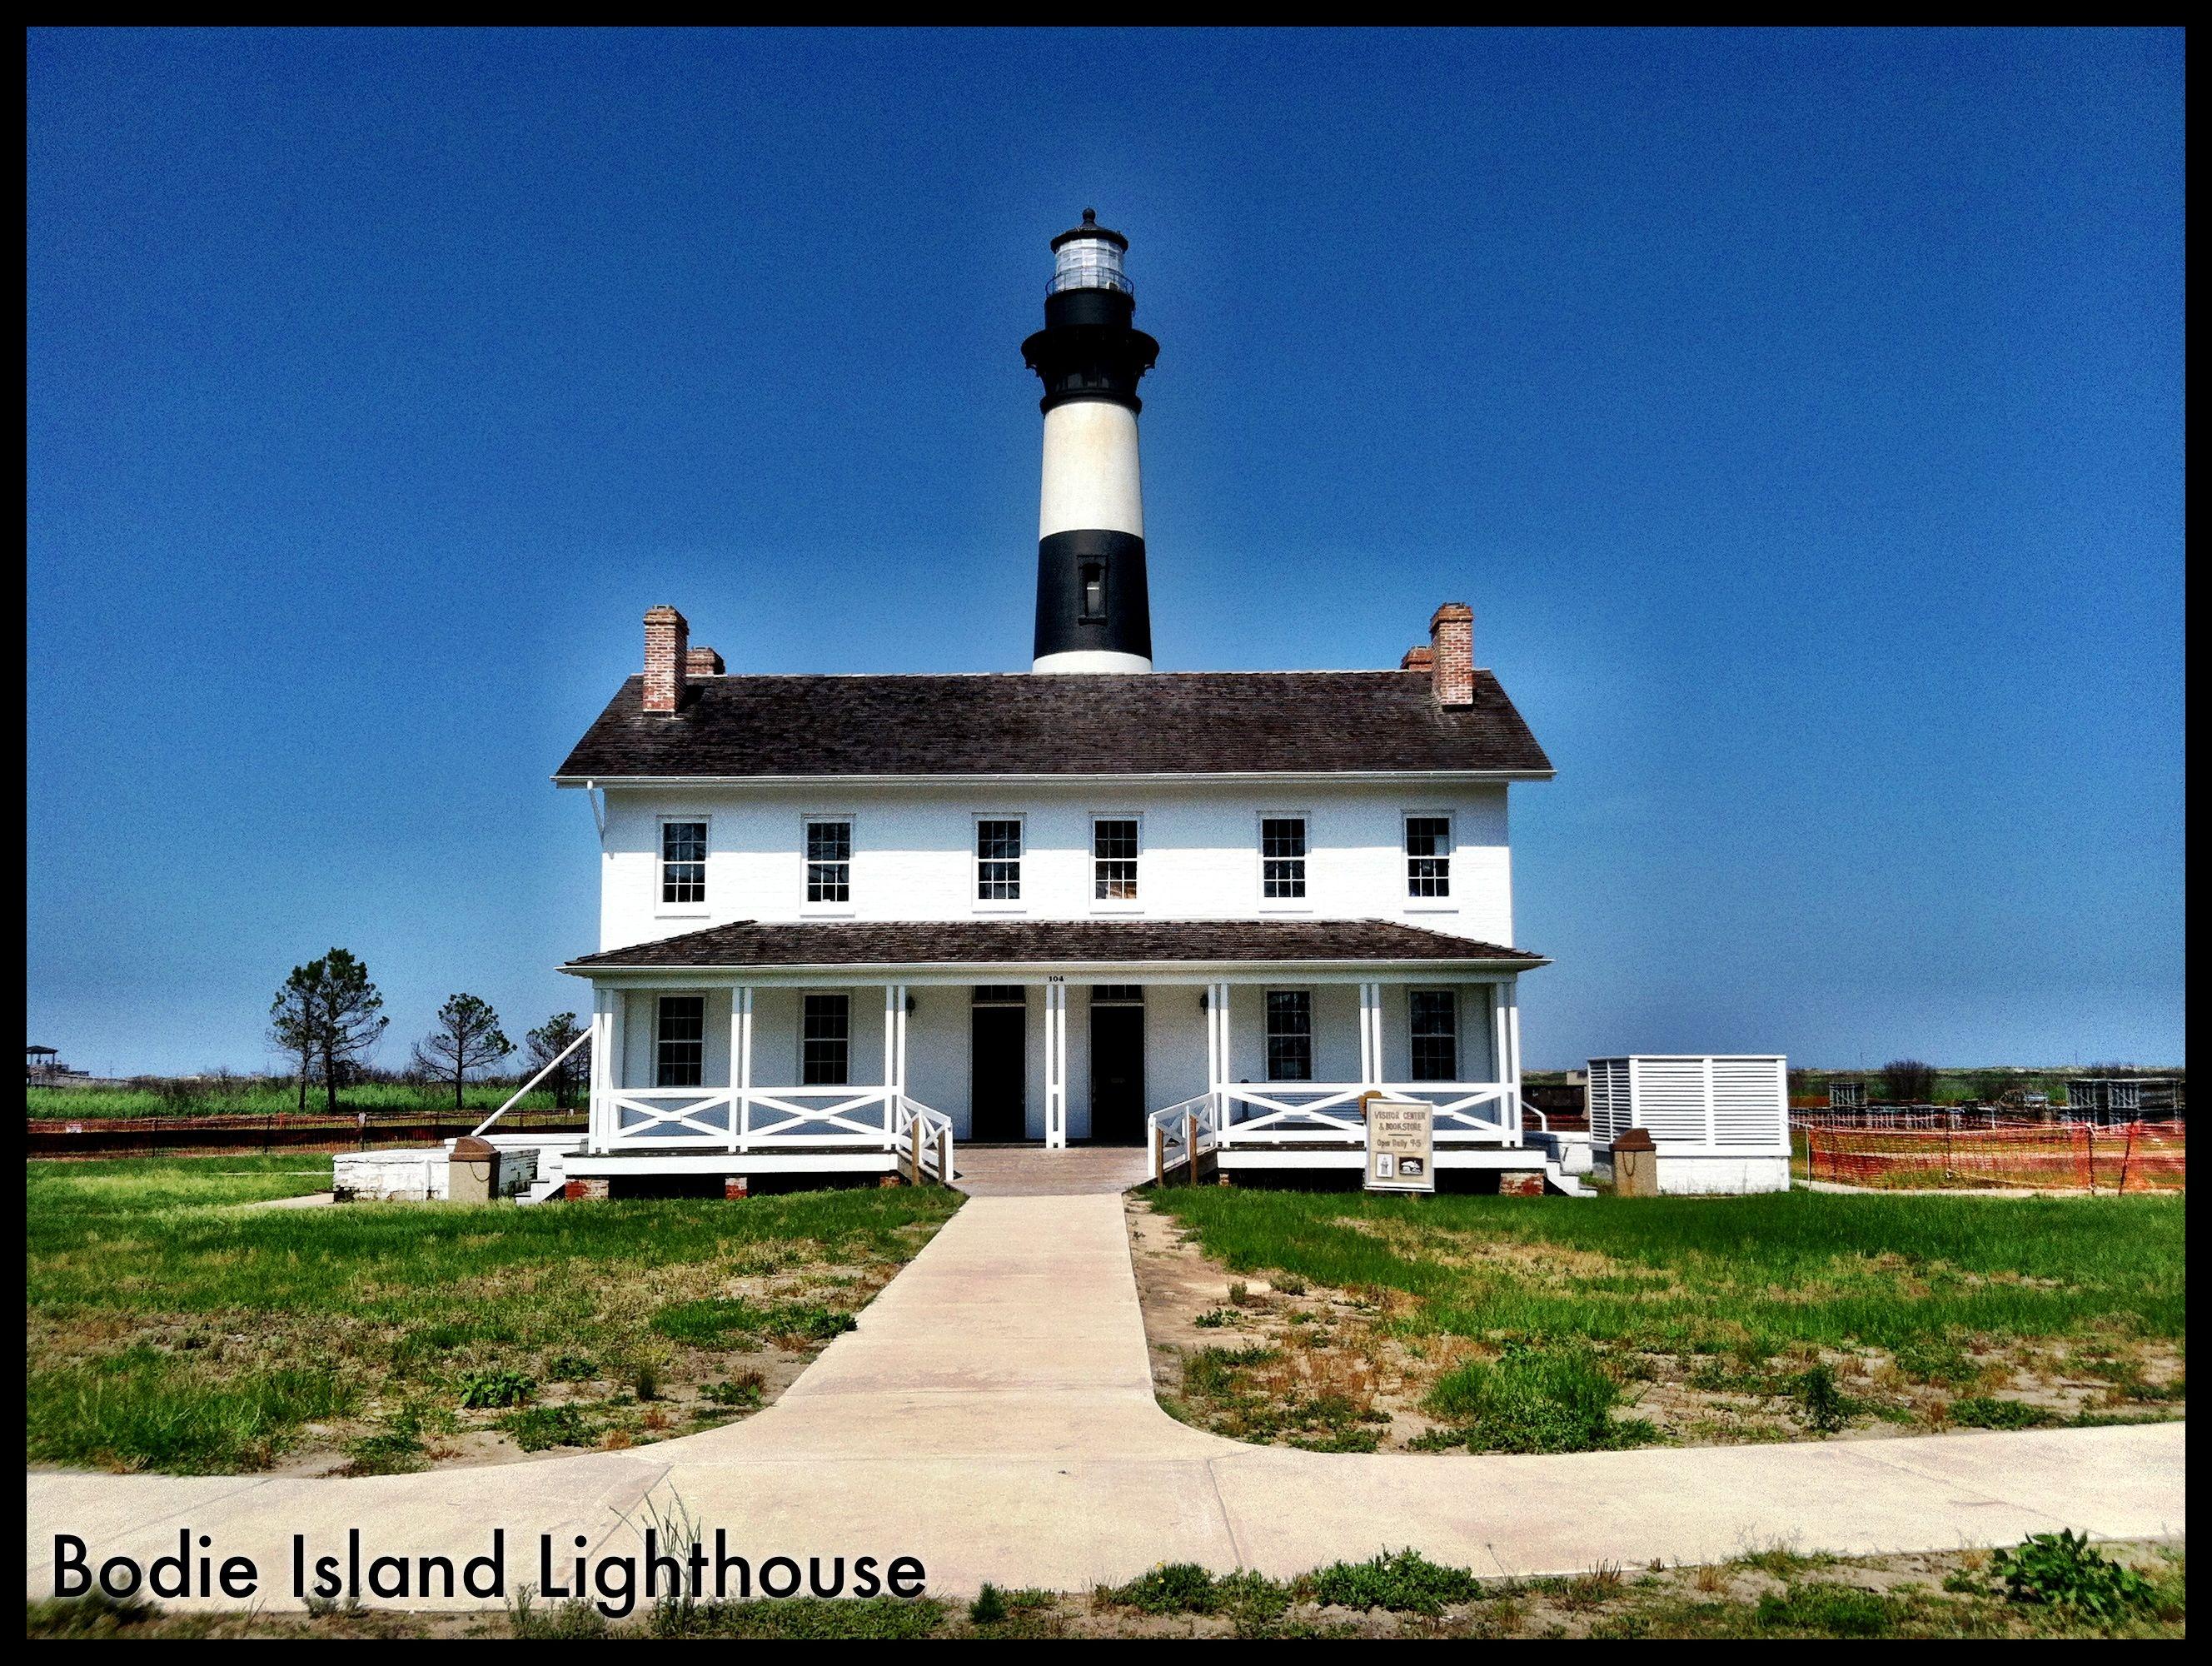 Bodie Lighthouse, North Carolina